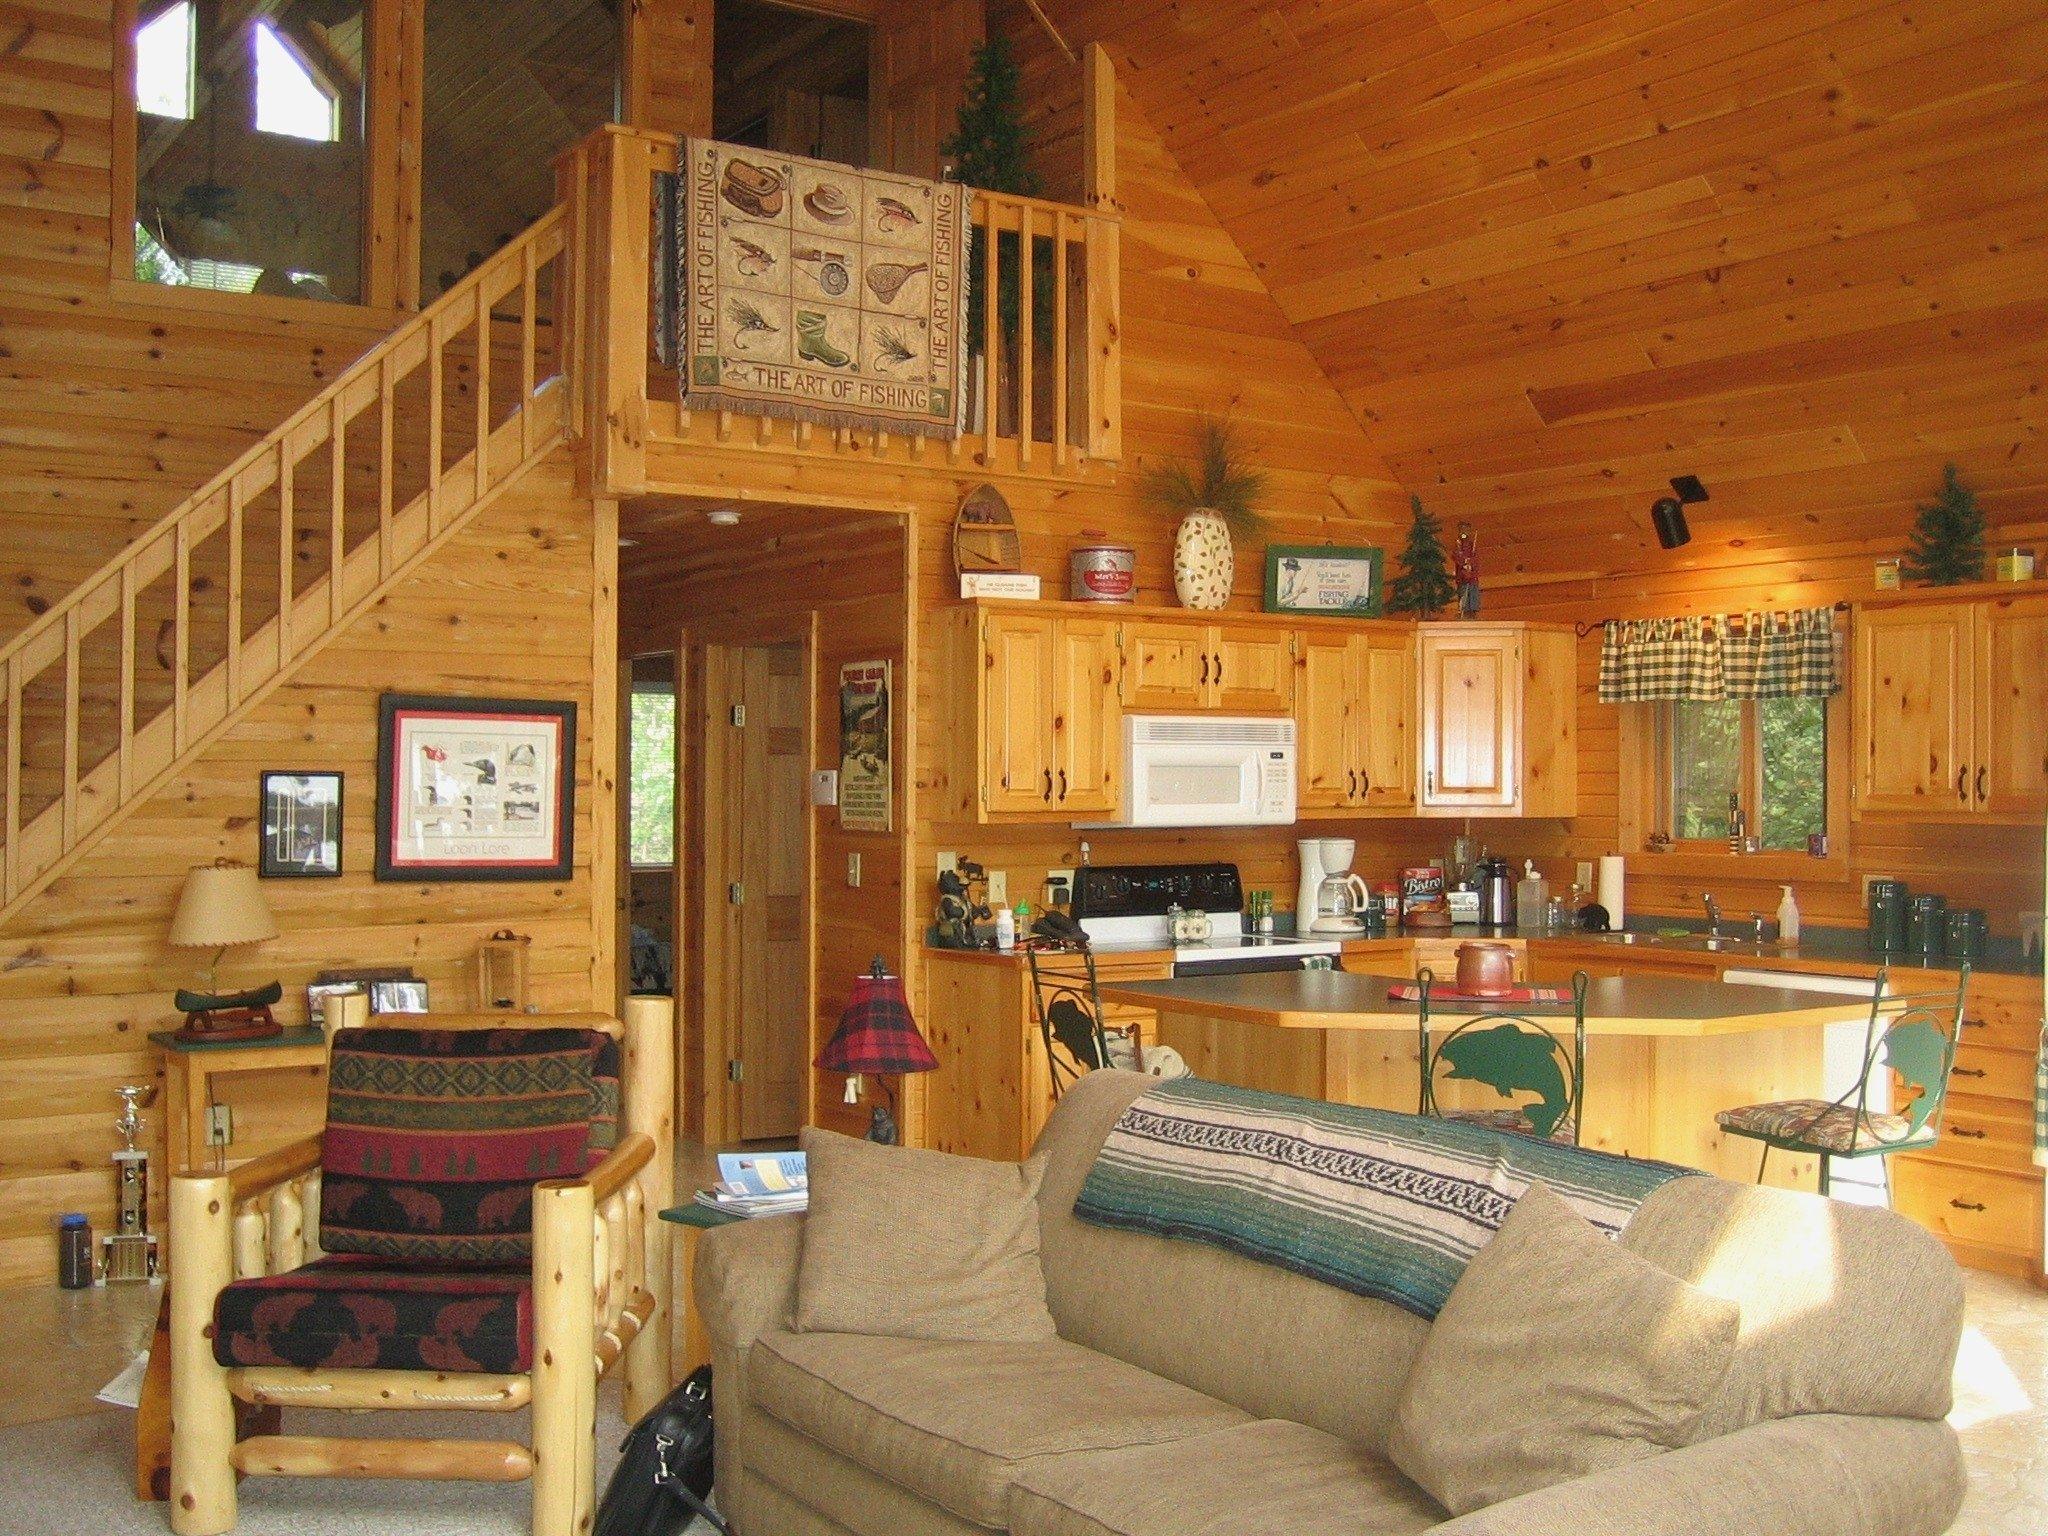 10 Most Popular Log Cabin Interior Design Ideas interior new log cabin interior design design ideas modern simple 2020